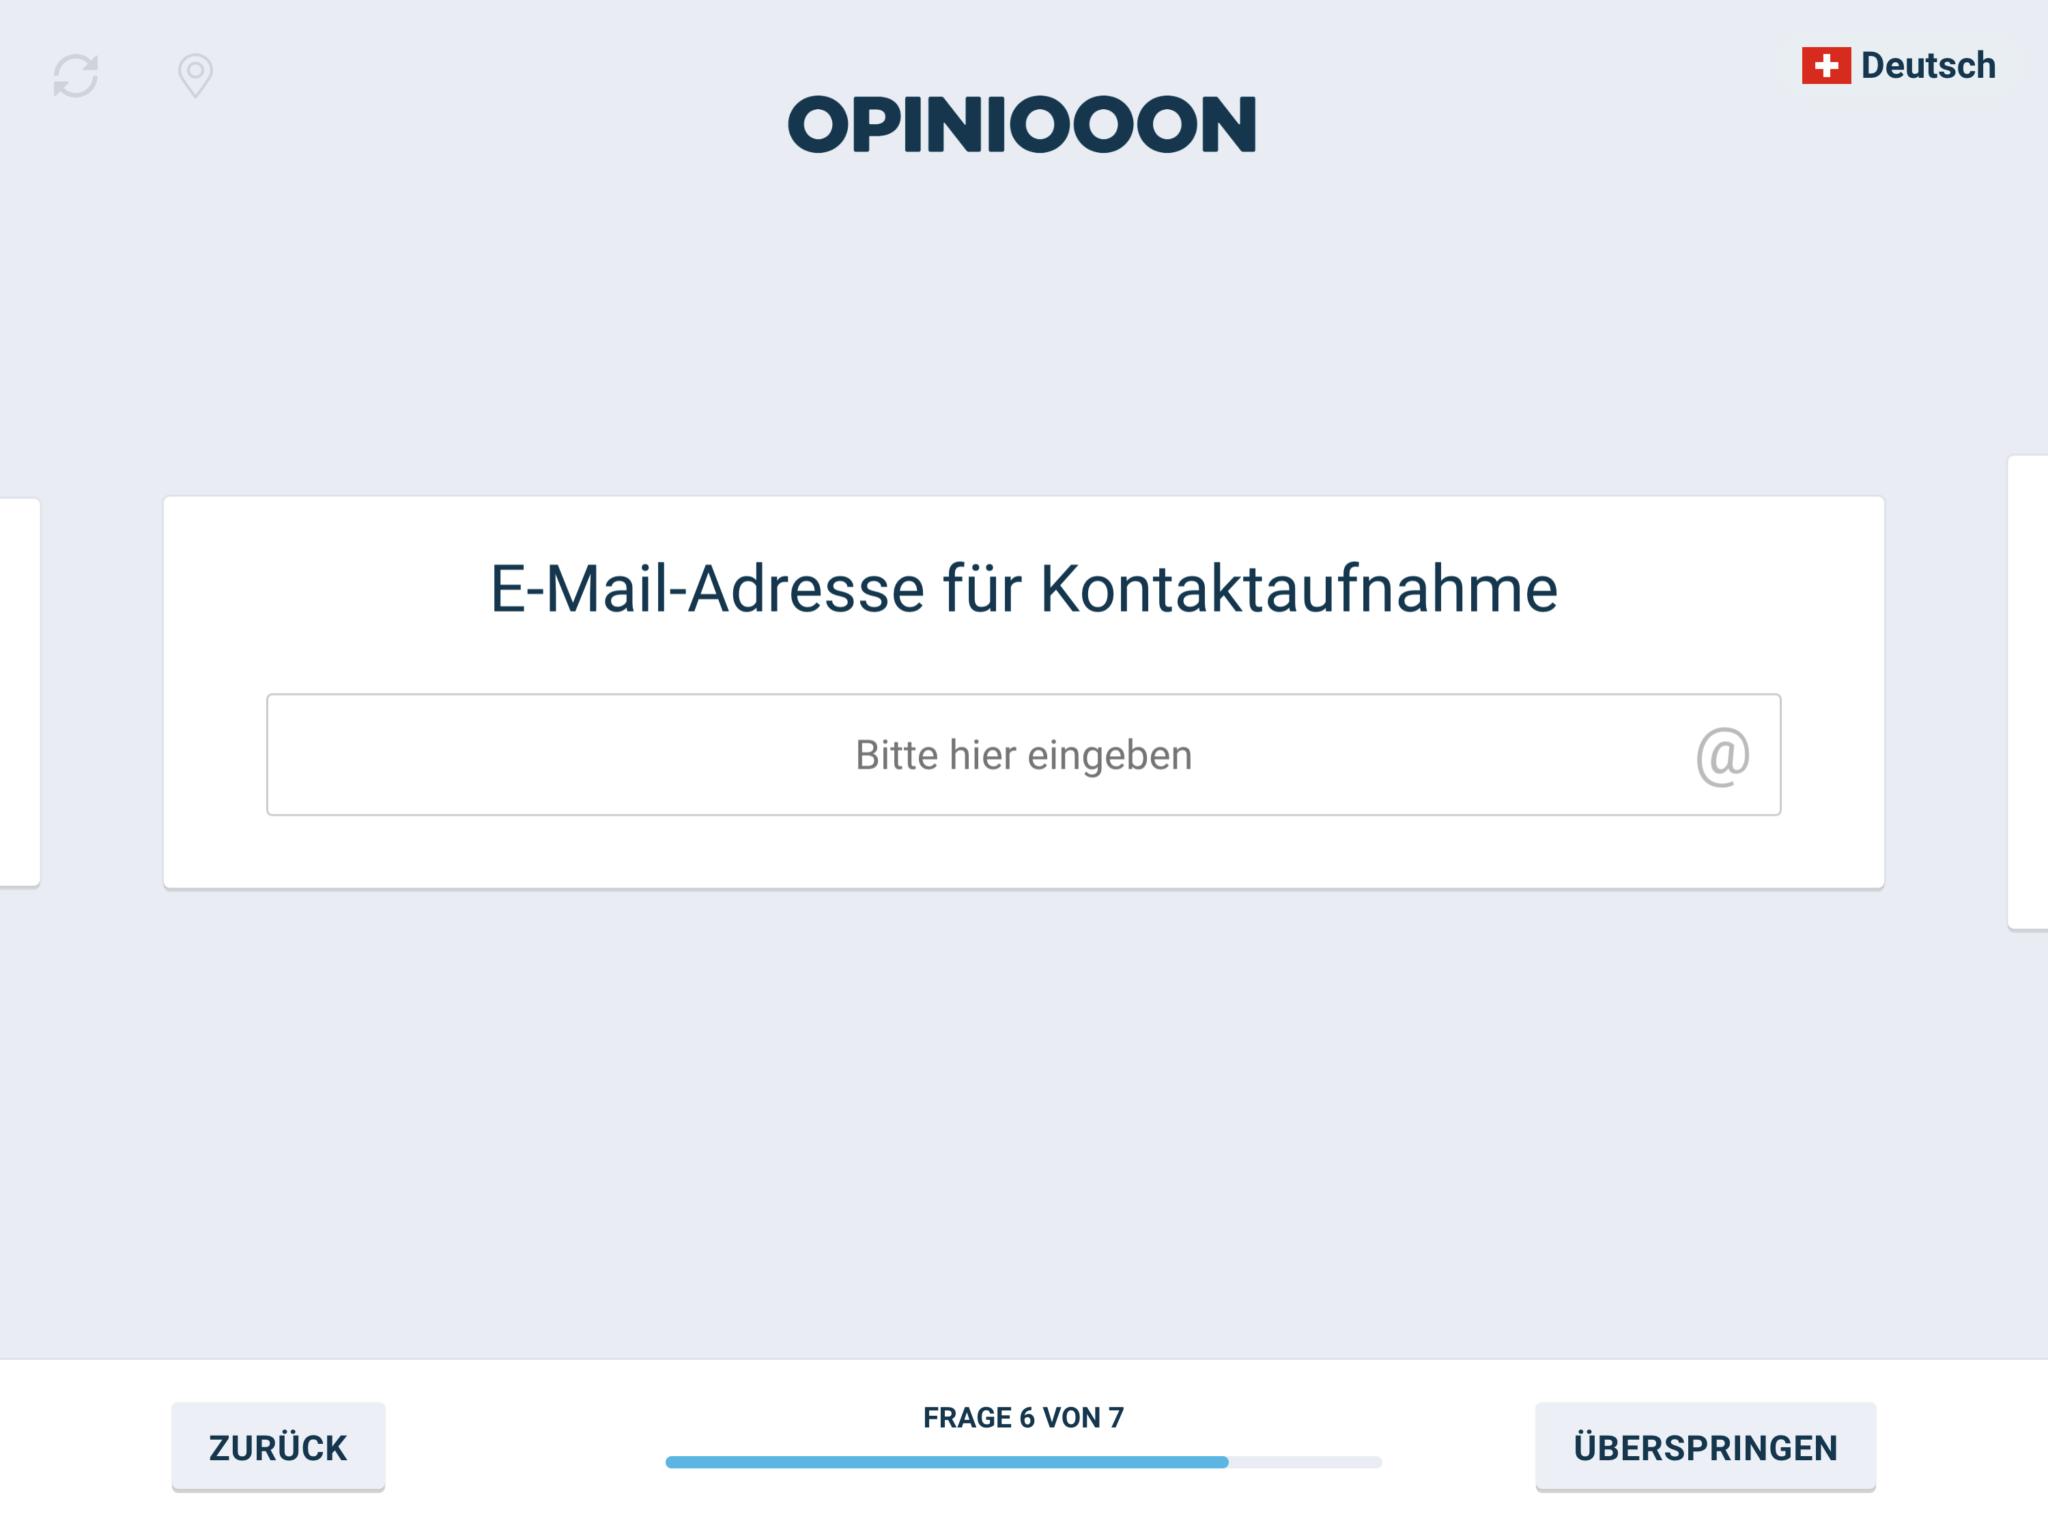 Fragetyp_E-Mail